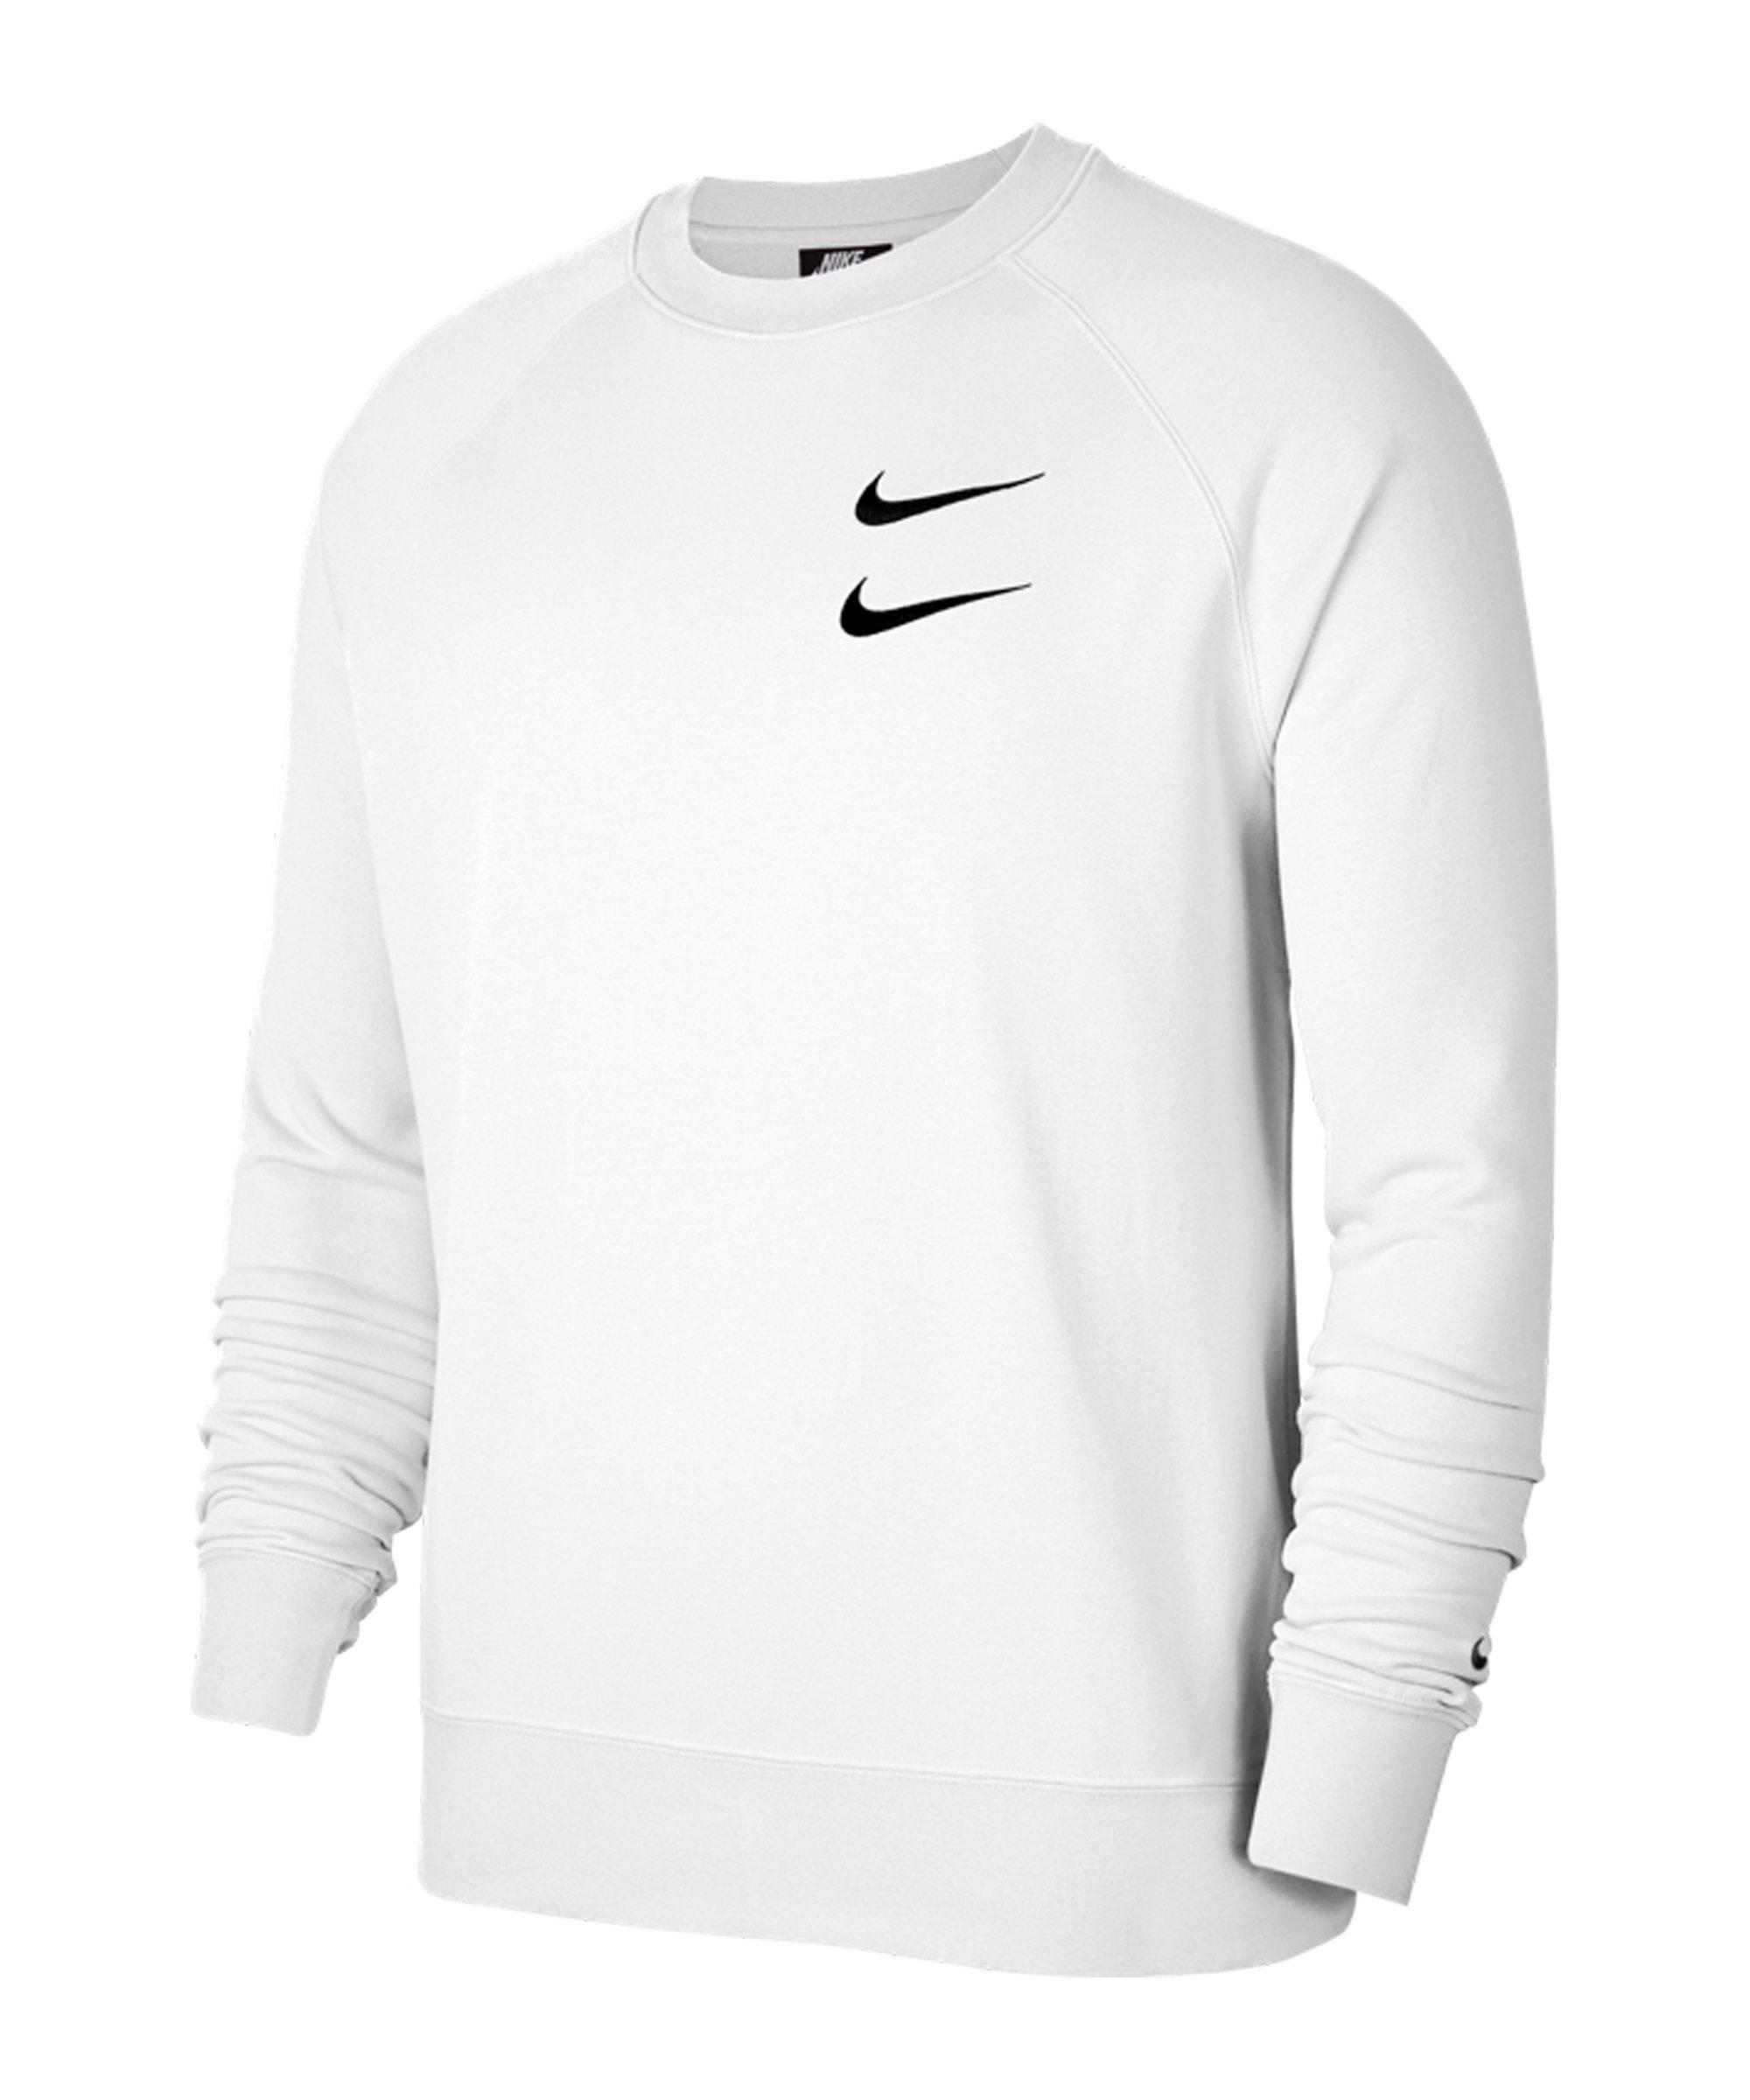 Nike Swoosh French Terry Crew Sweatshirt F101 - weiss